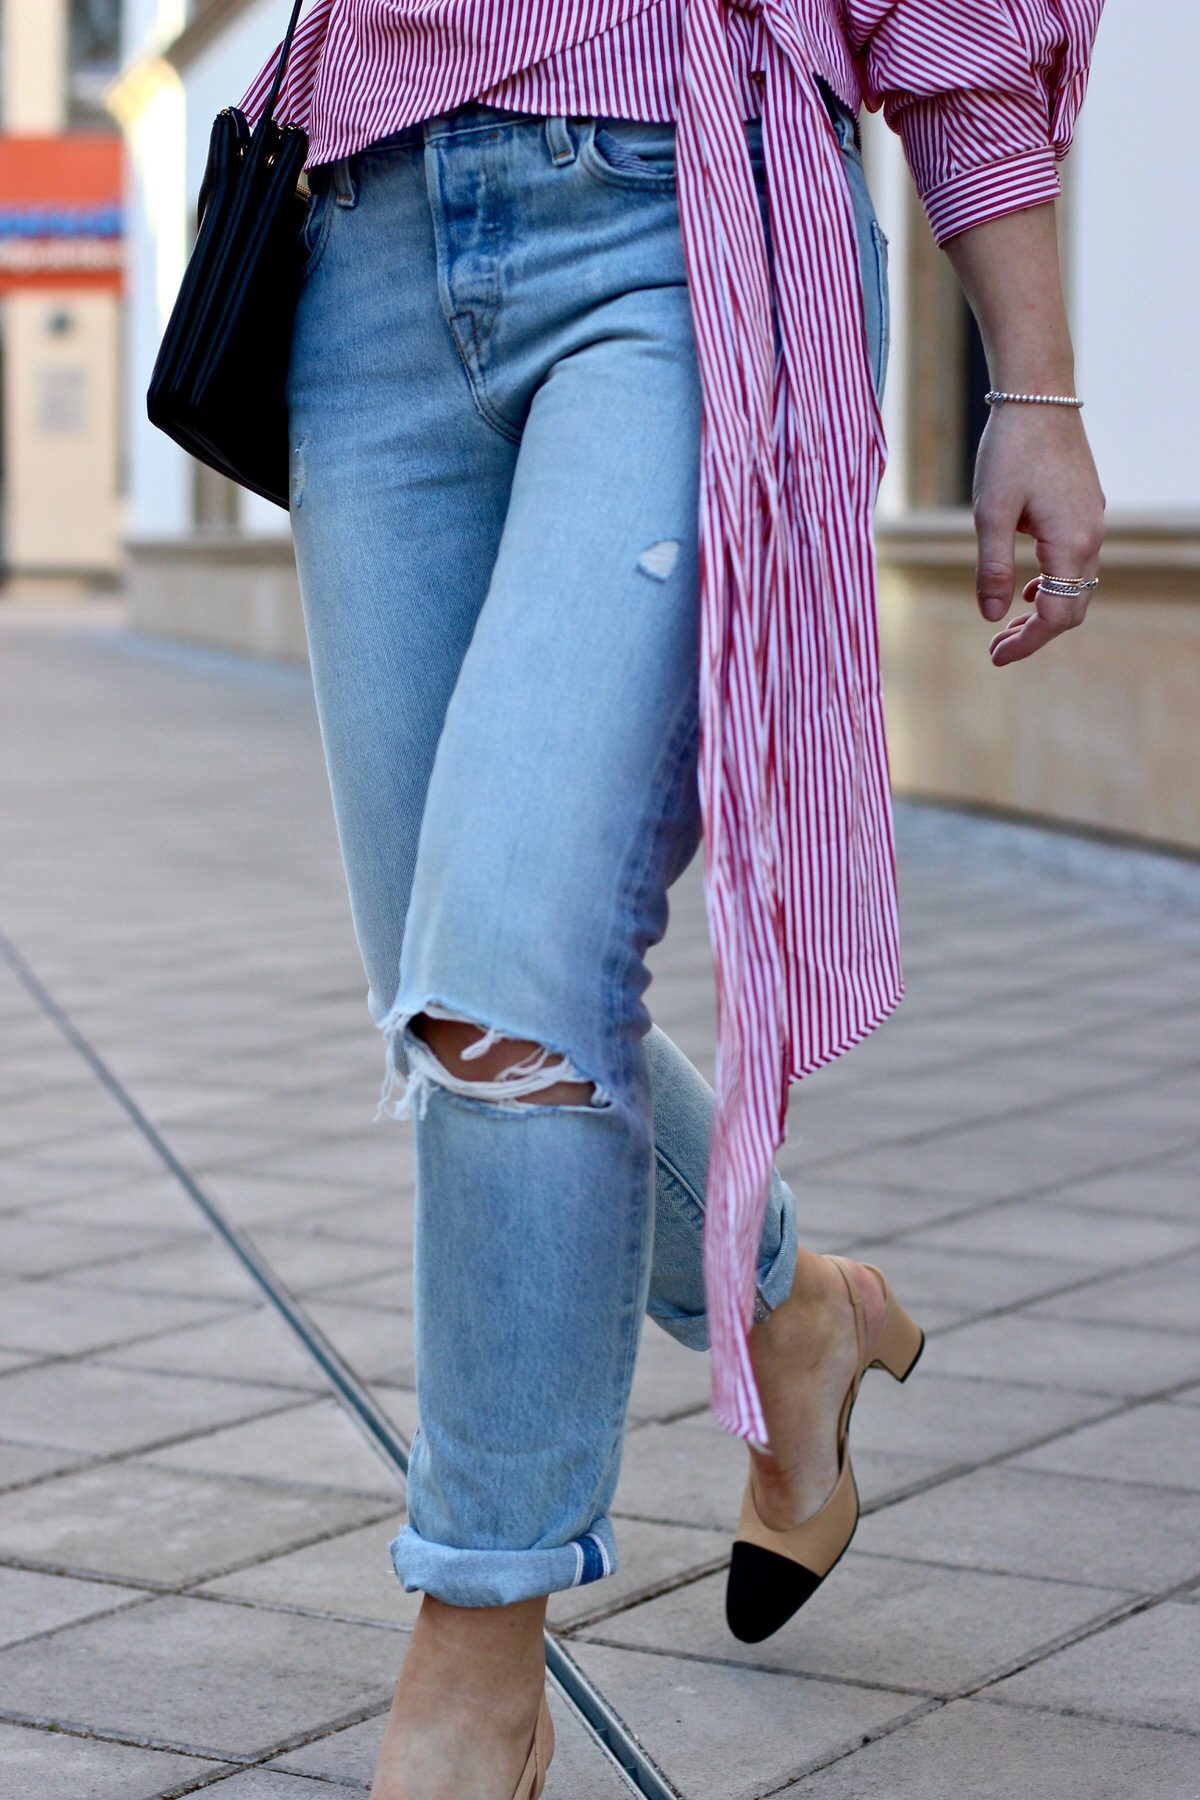 Chanel Slingbacks, Céline Trio Bag, Levis 501, Zara Bluse, Streetstyle